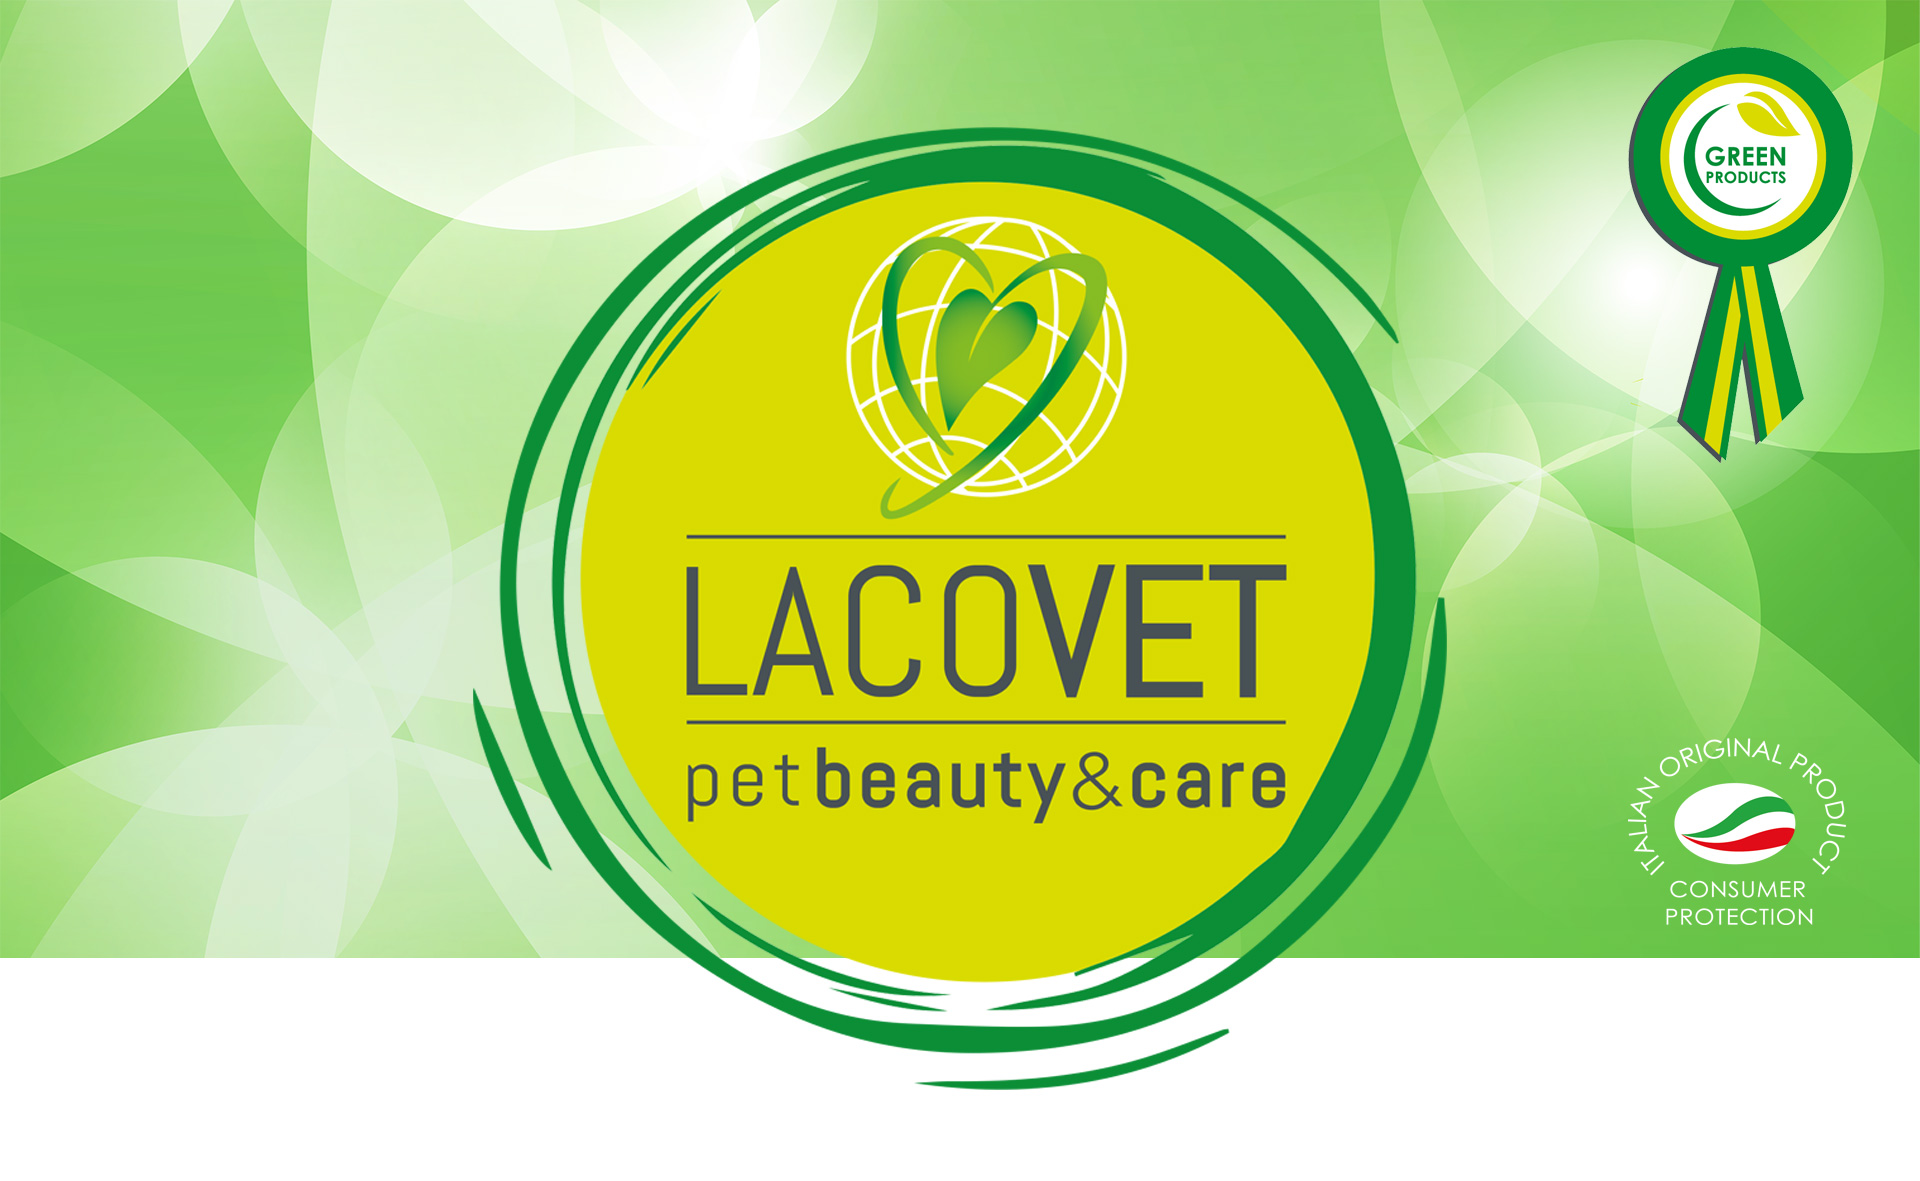 LACOVET pet beauty&care